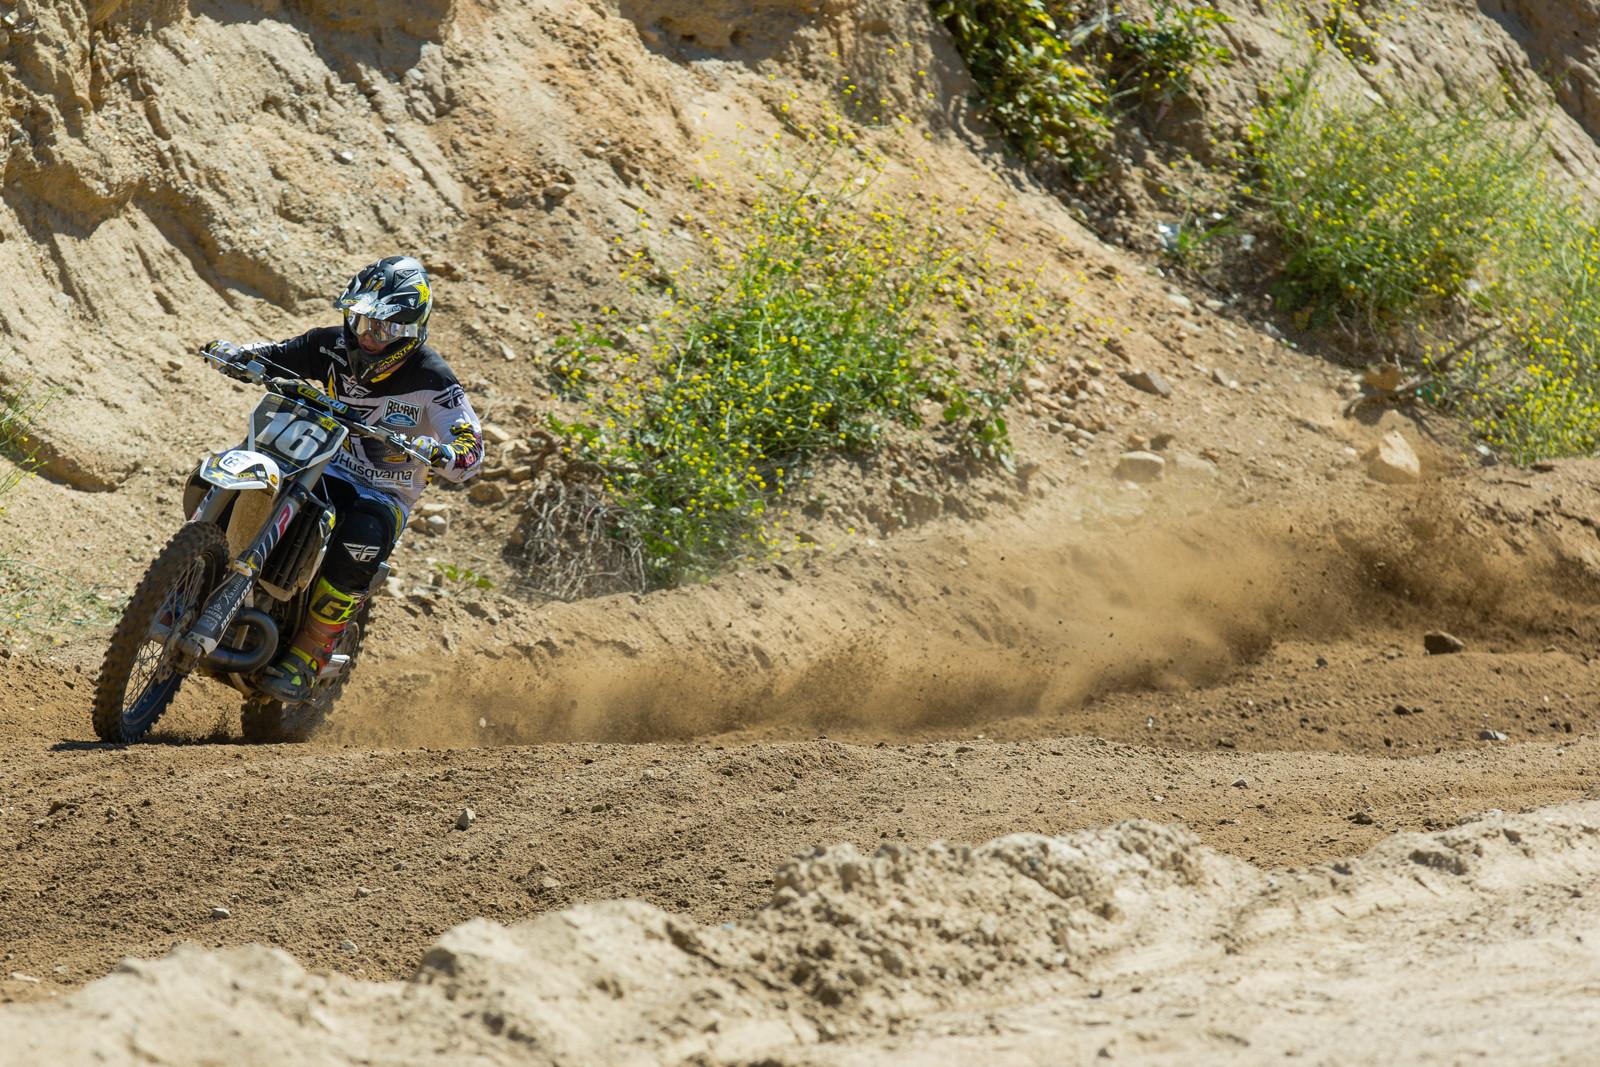 Zach Osborne - 2016 MTA World Two-Stroke Nationals - Motocross Pictures - Vital MX